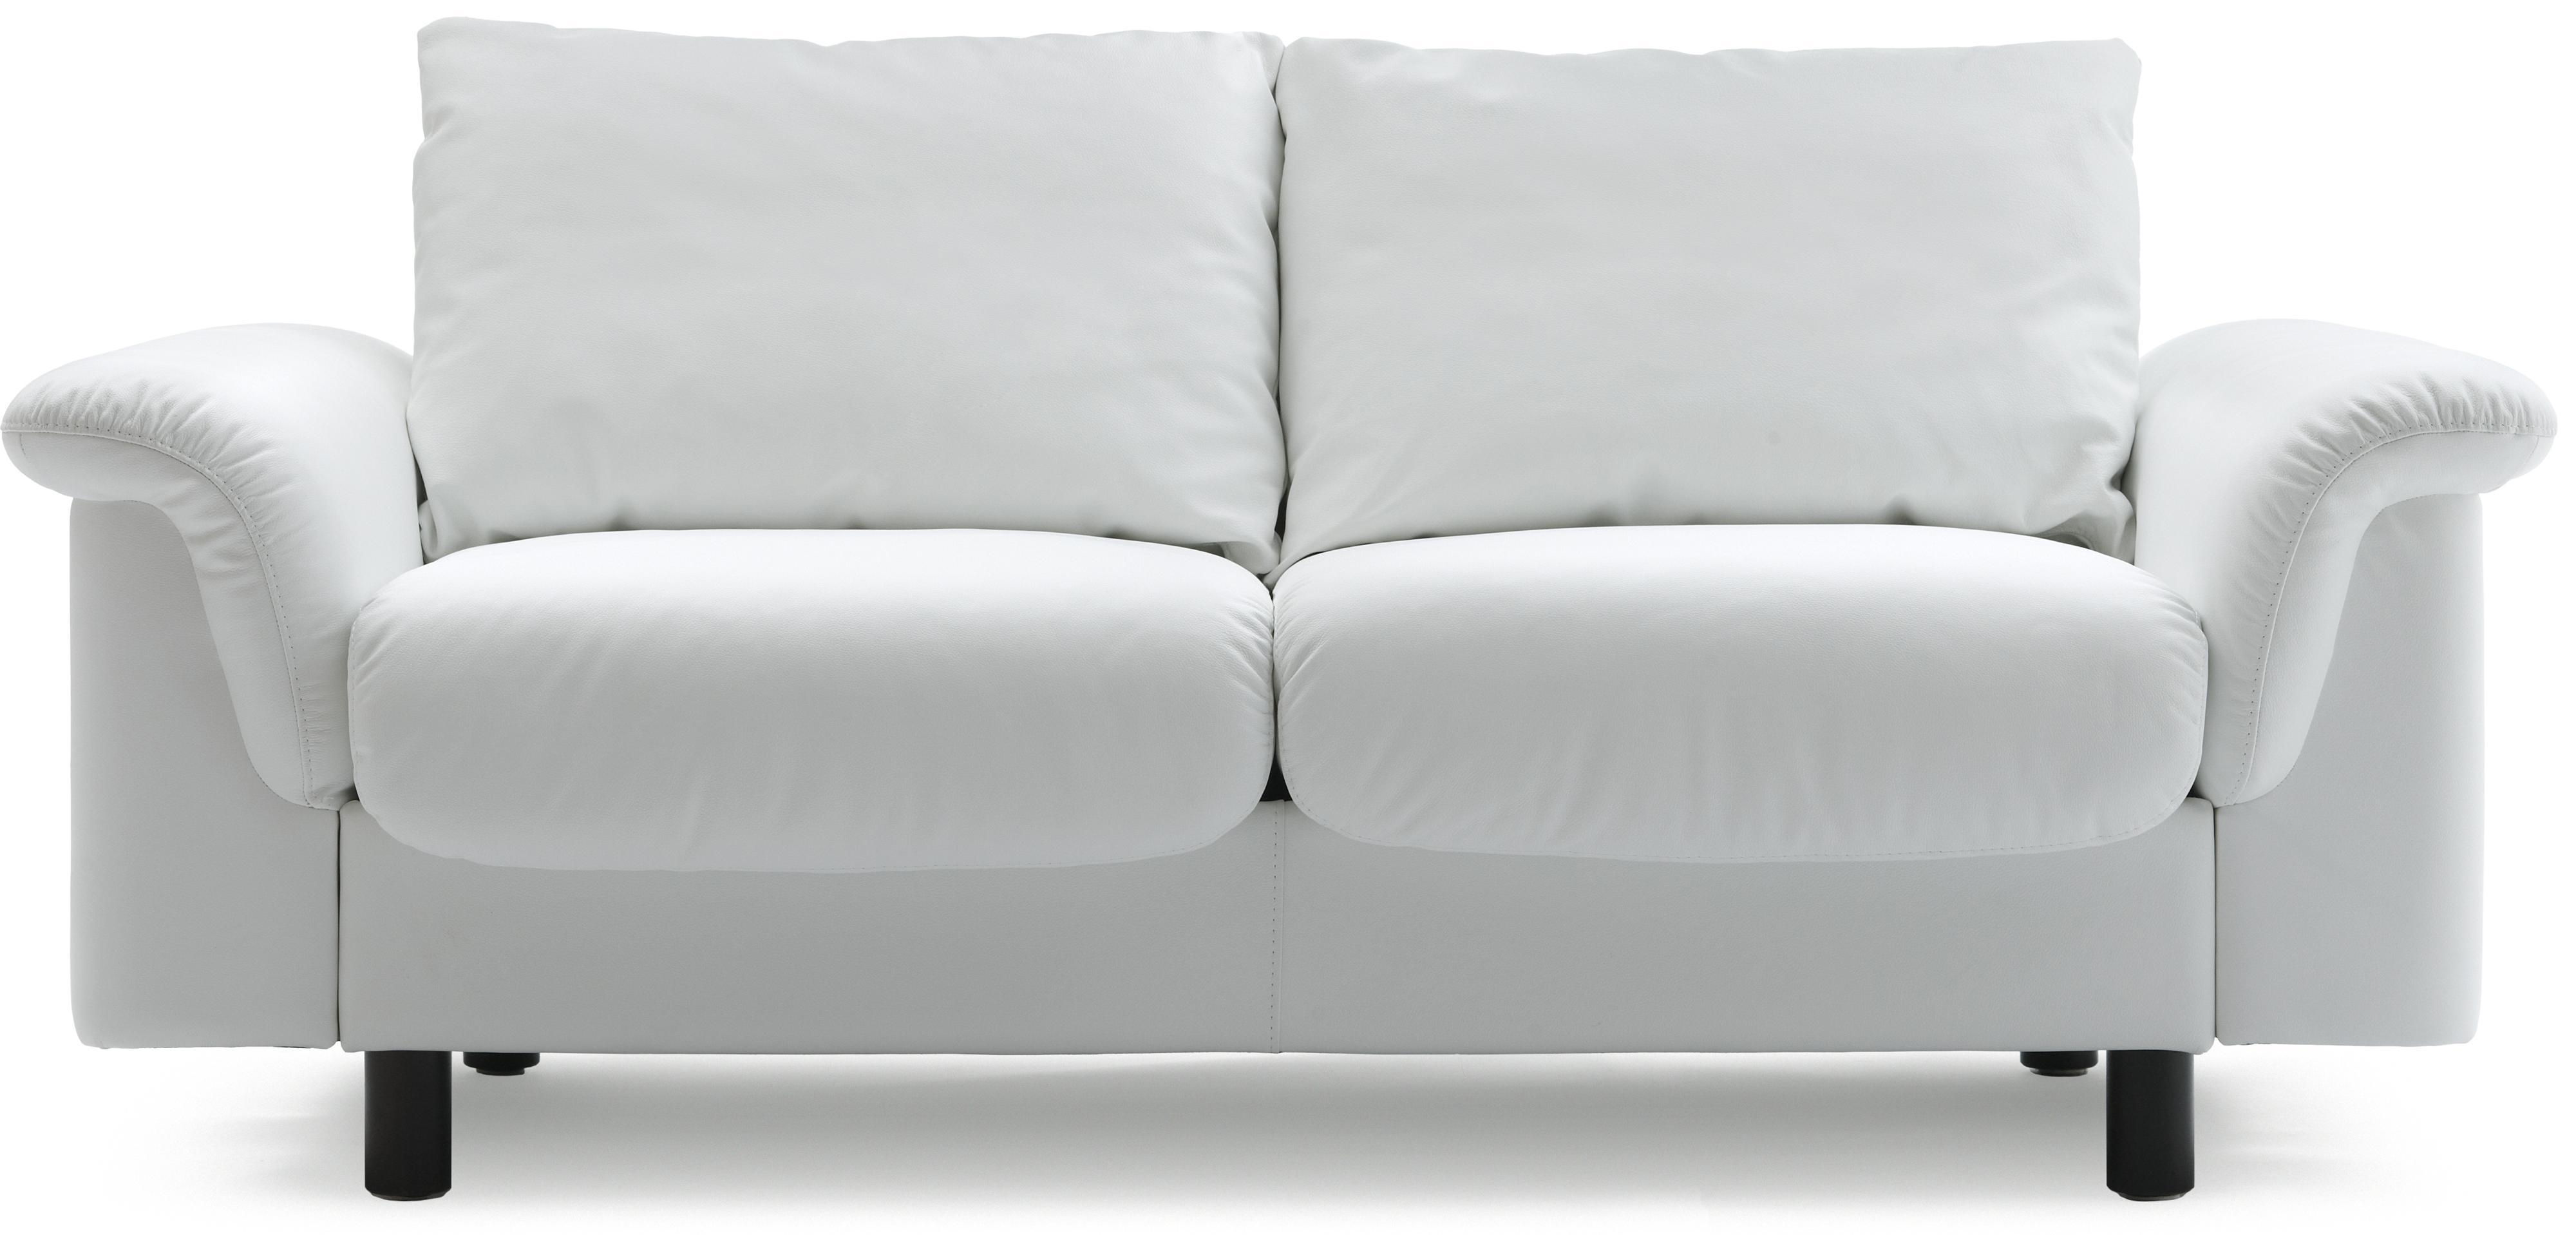 Stressless E300 2 Seater Loveseat   Item Number: E300 2 Seat Sofa